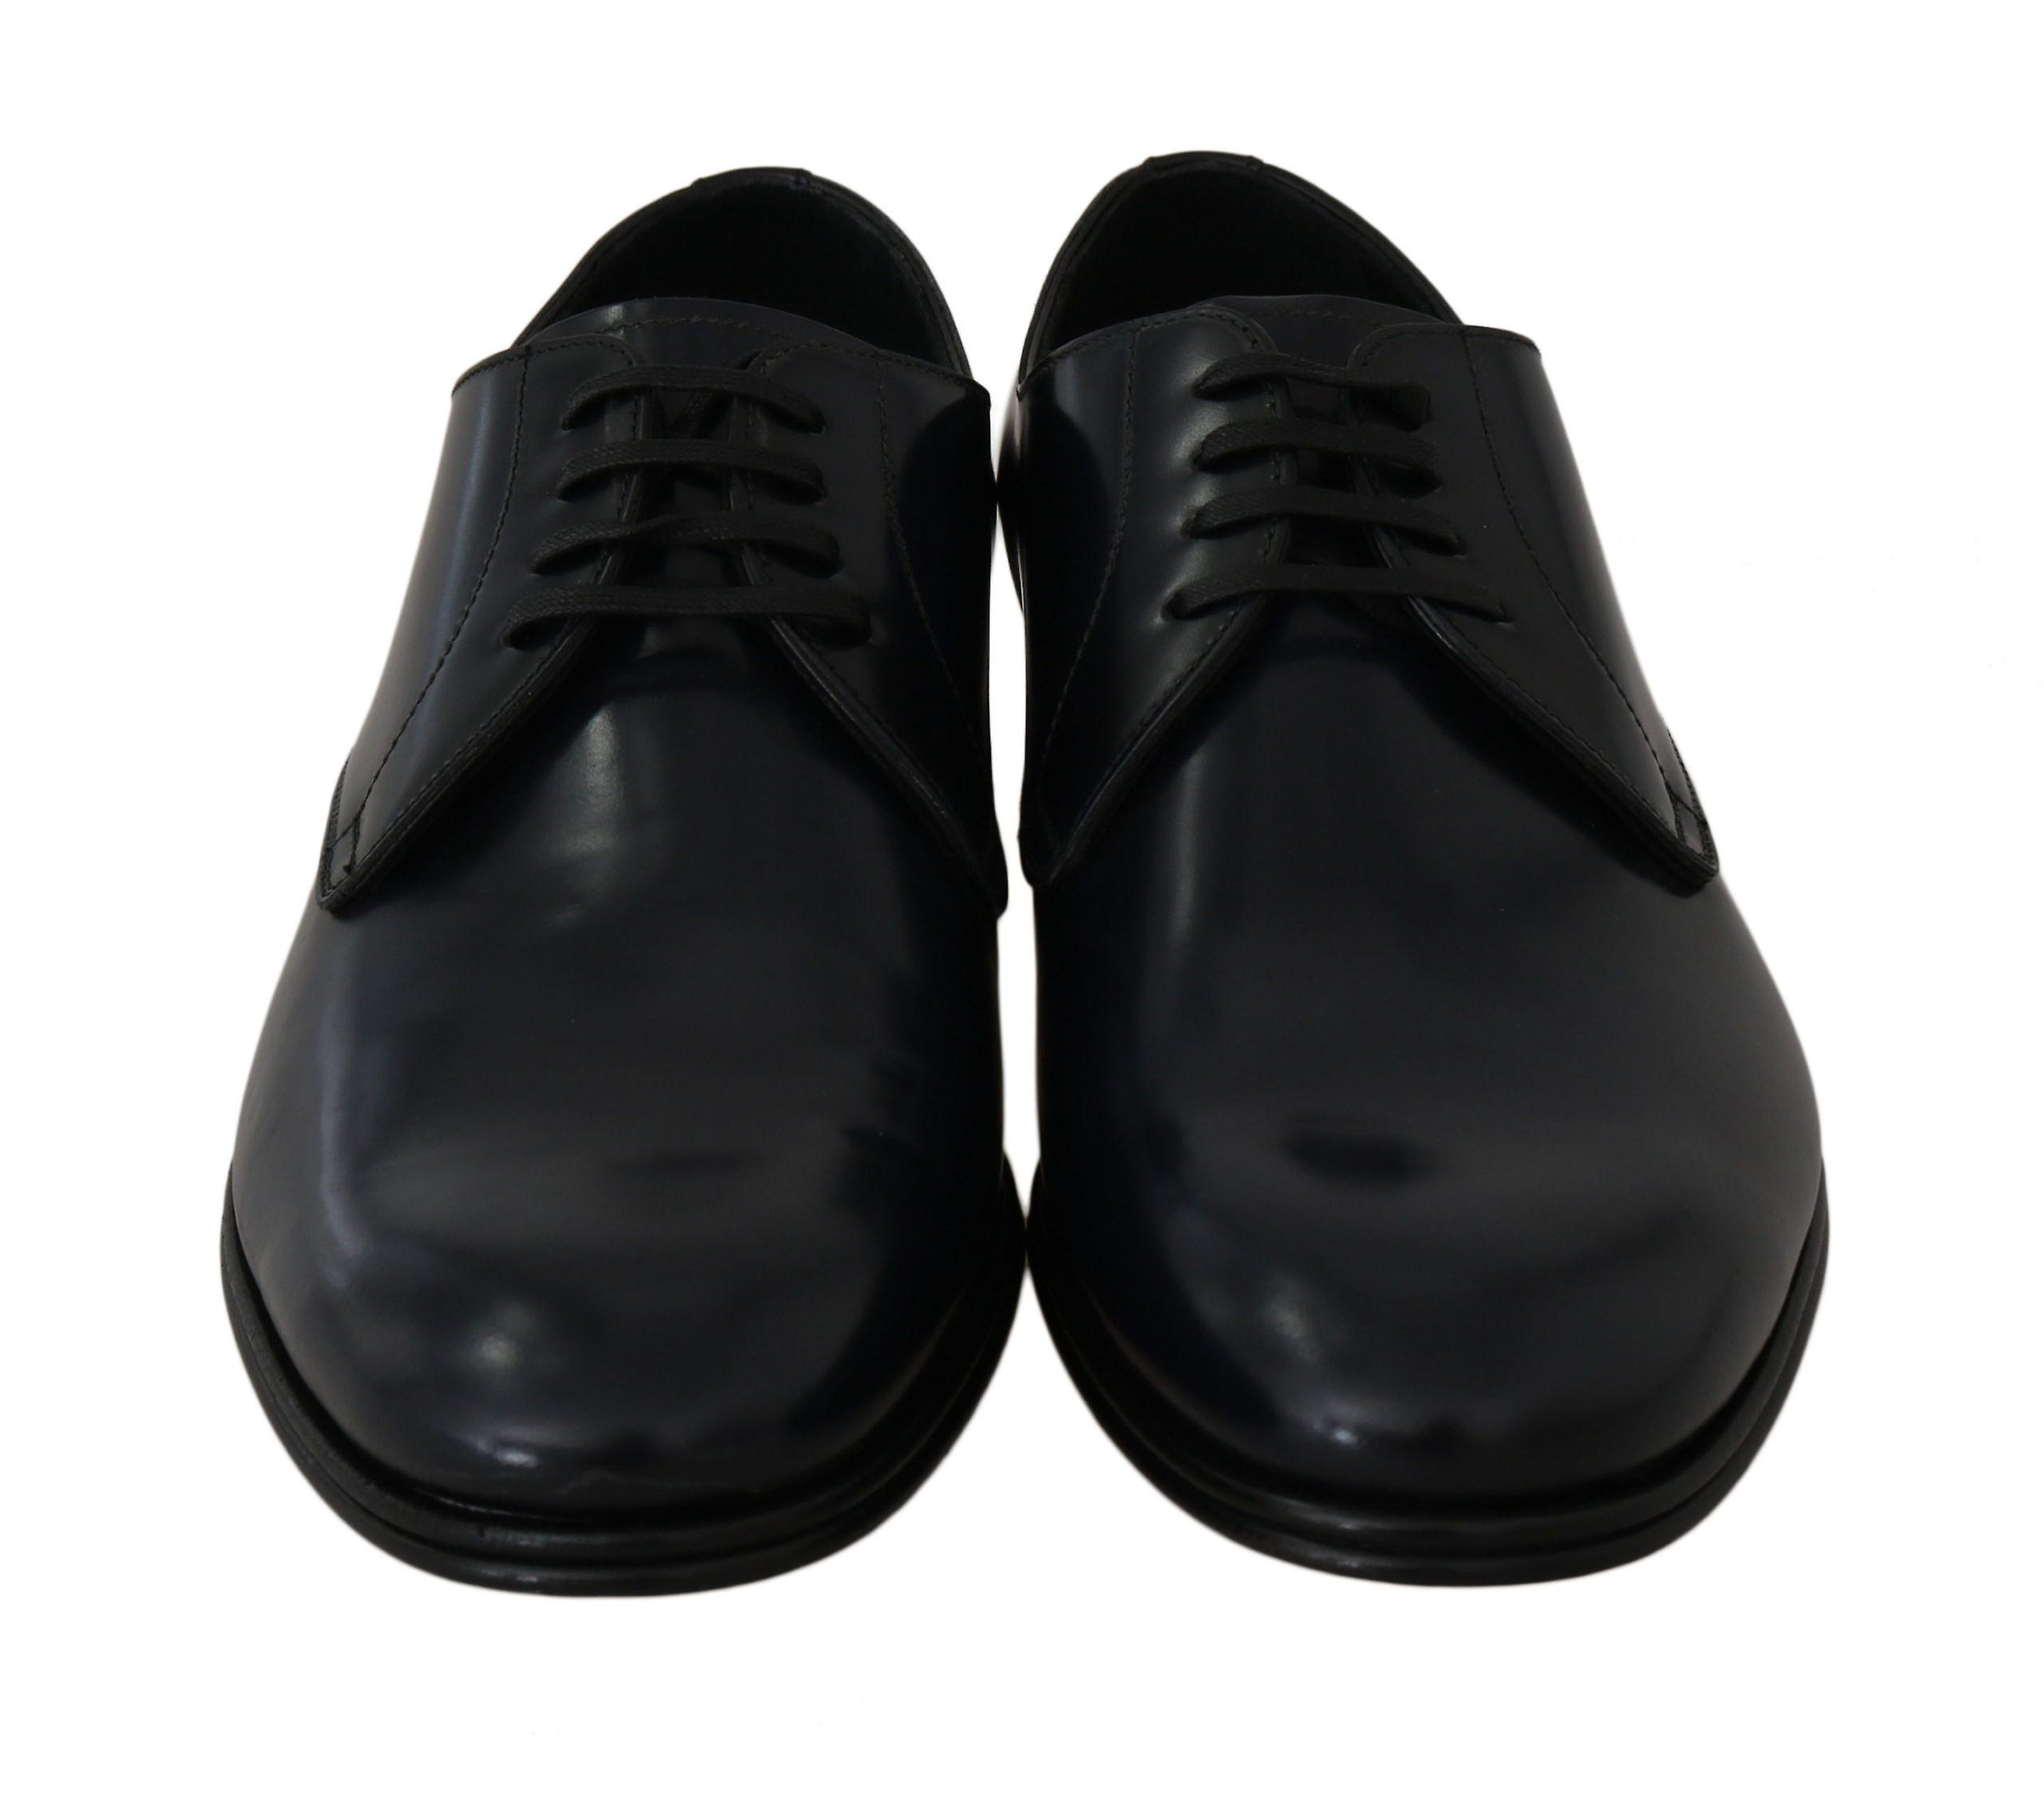 Dolce & Gabbana Blue Leather Mens Derby Formal Dress Shoes MV2107-41